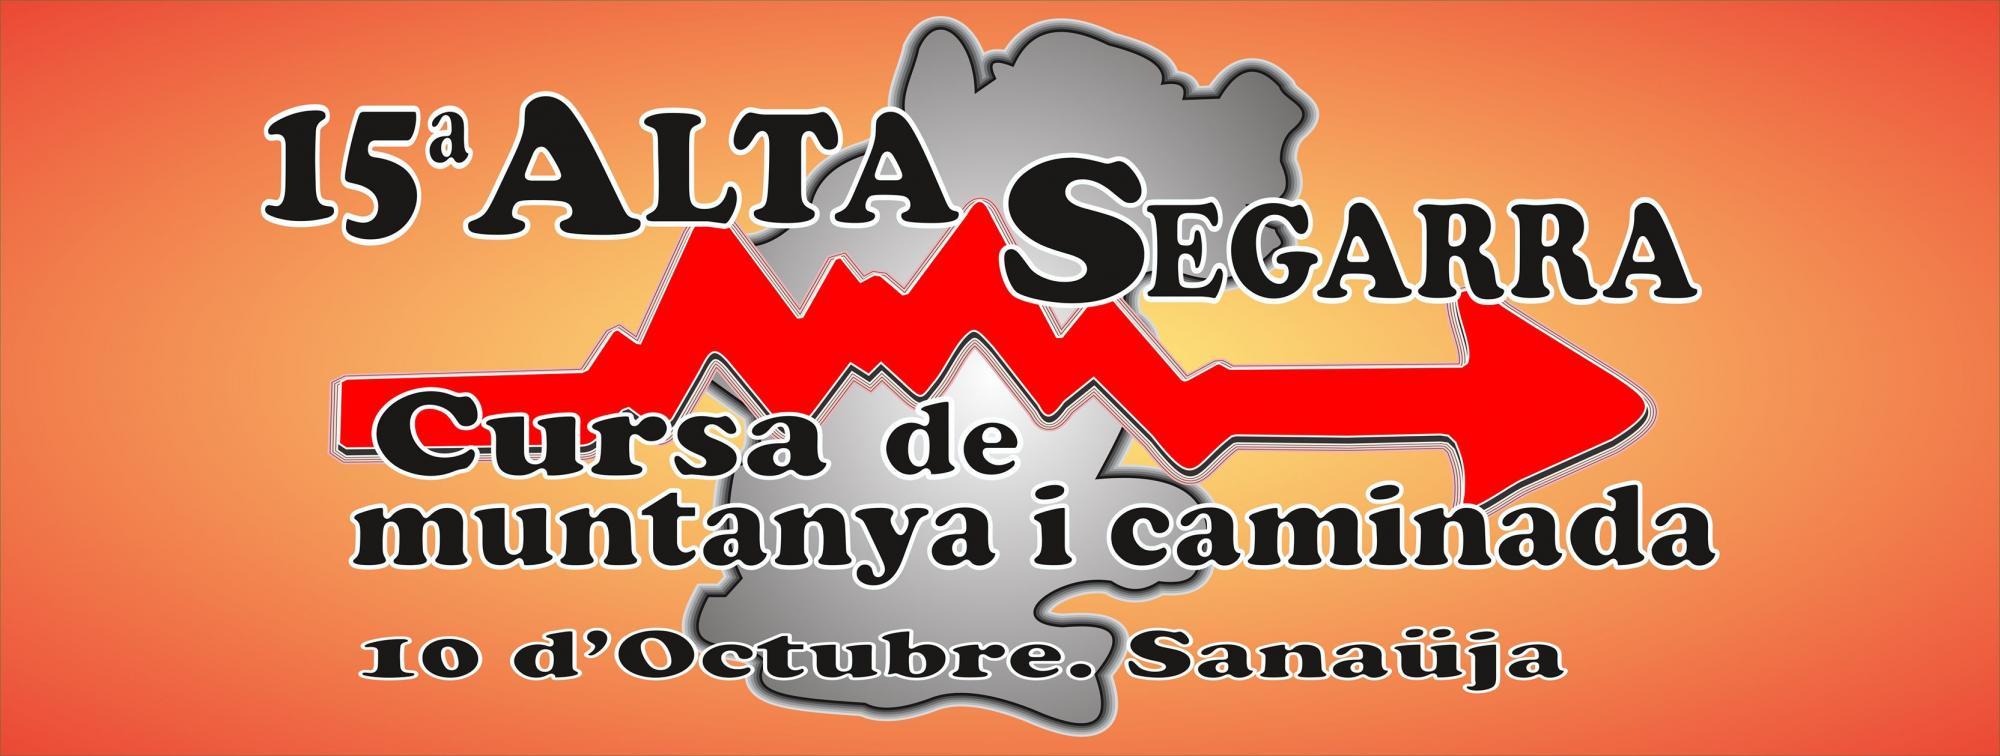 cartell XV Cursa de muntanya Alta Segarra